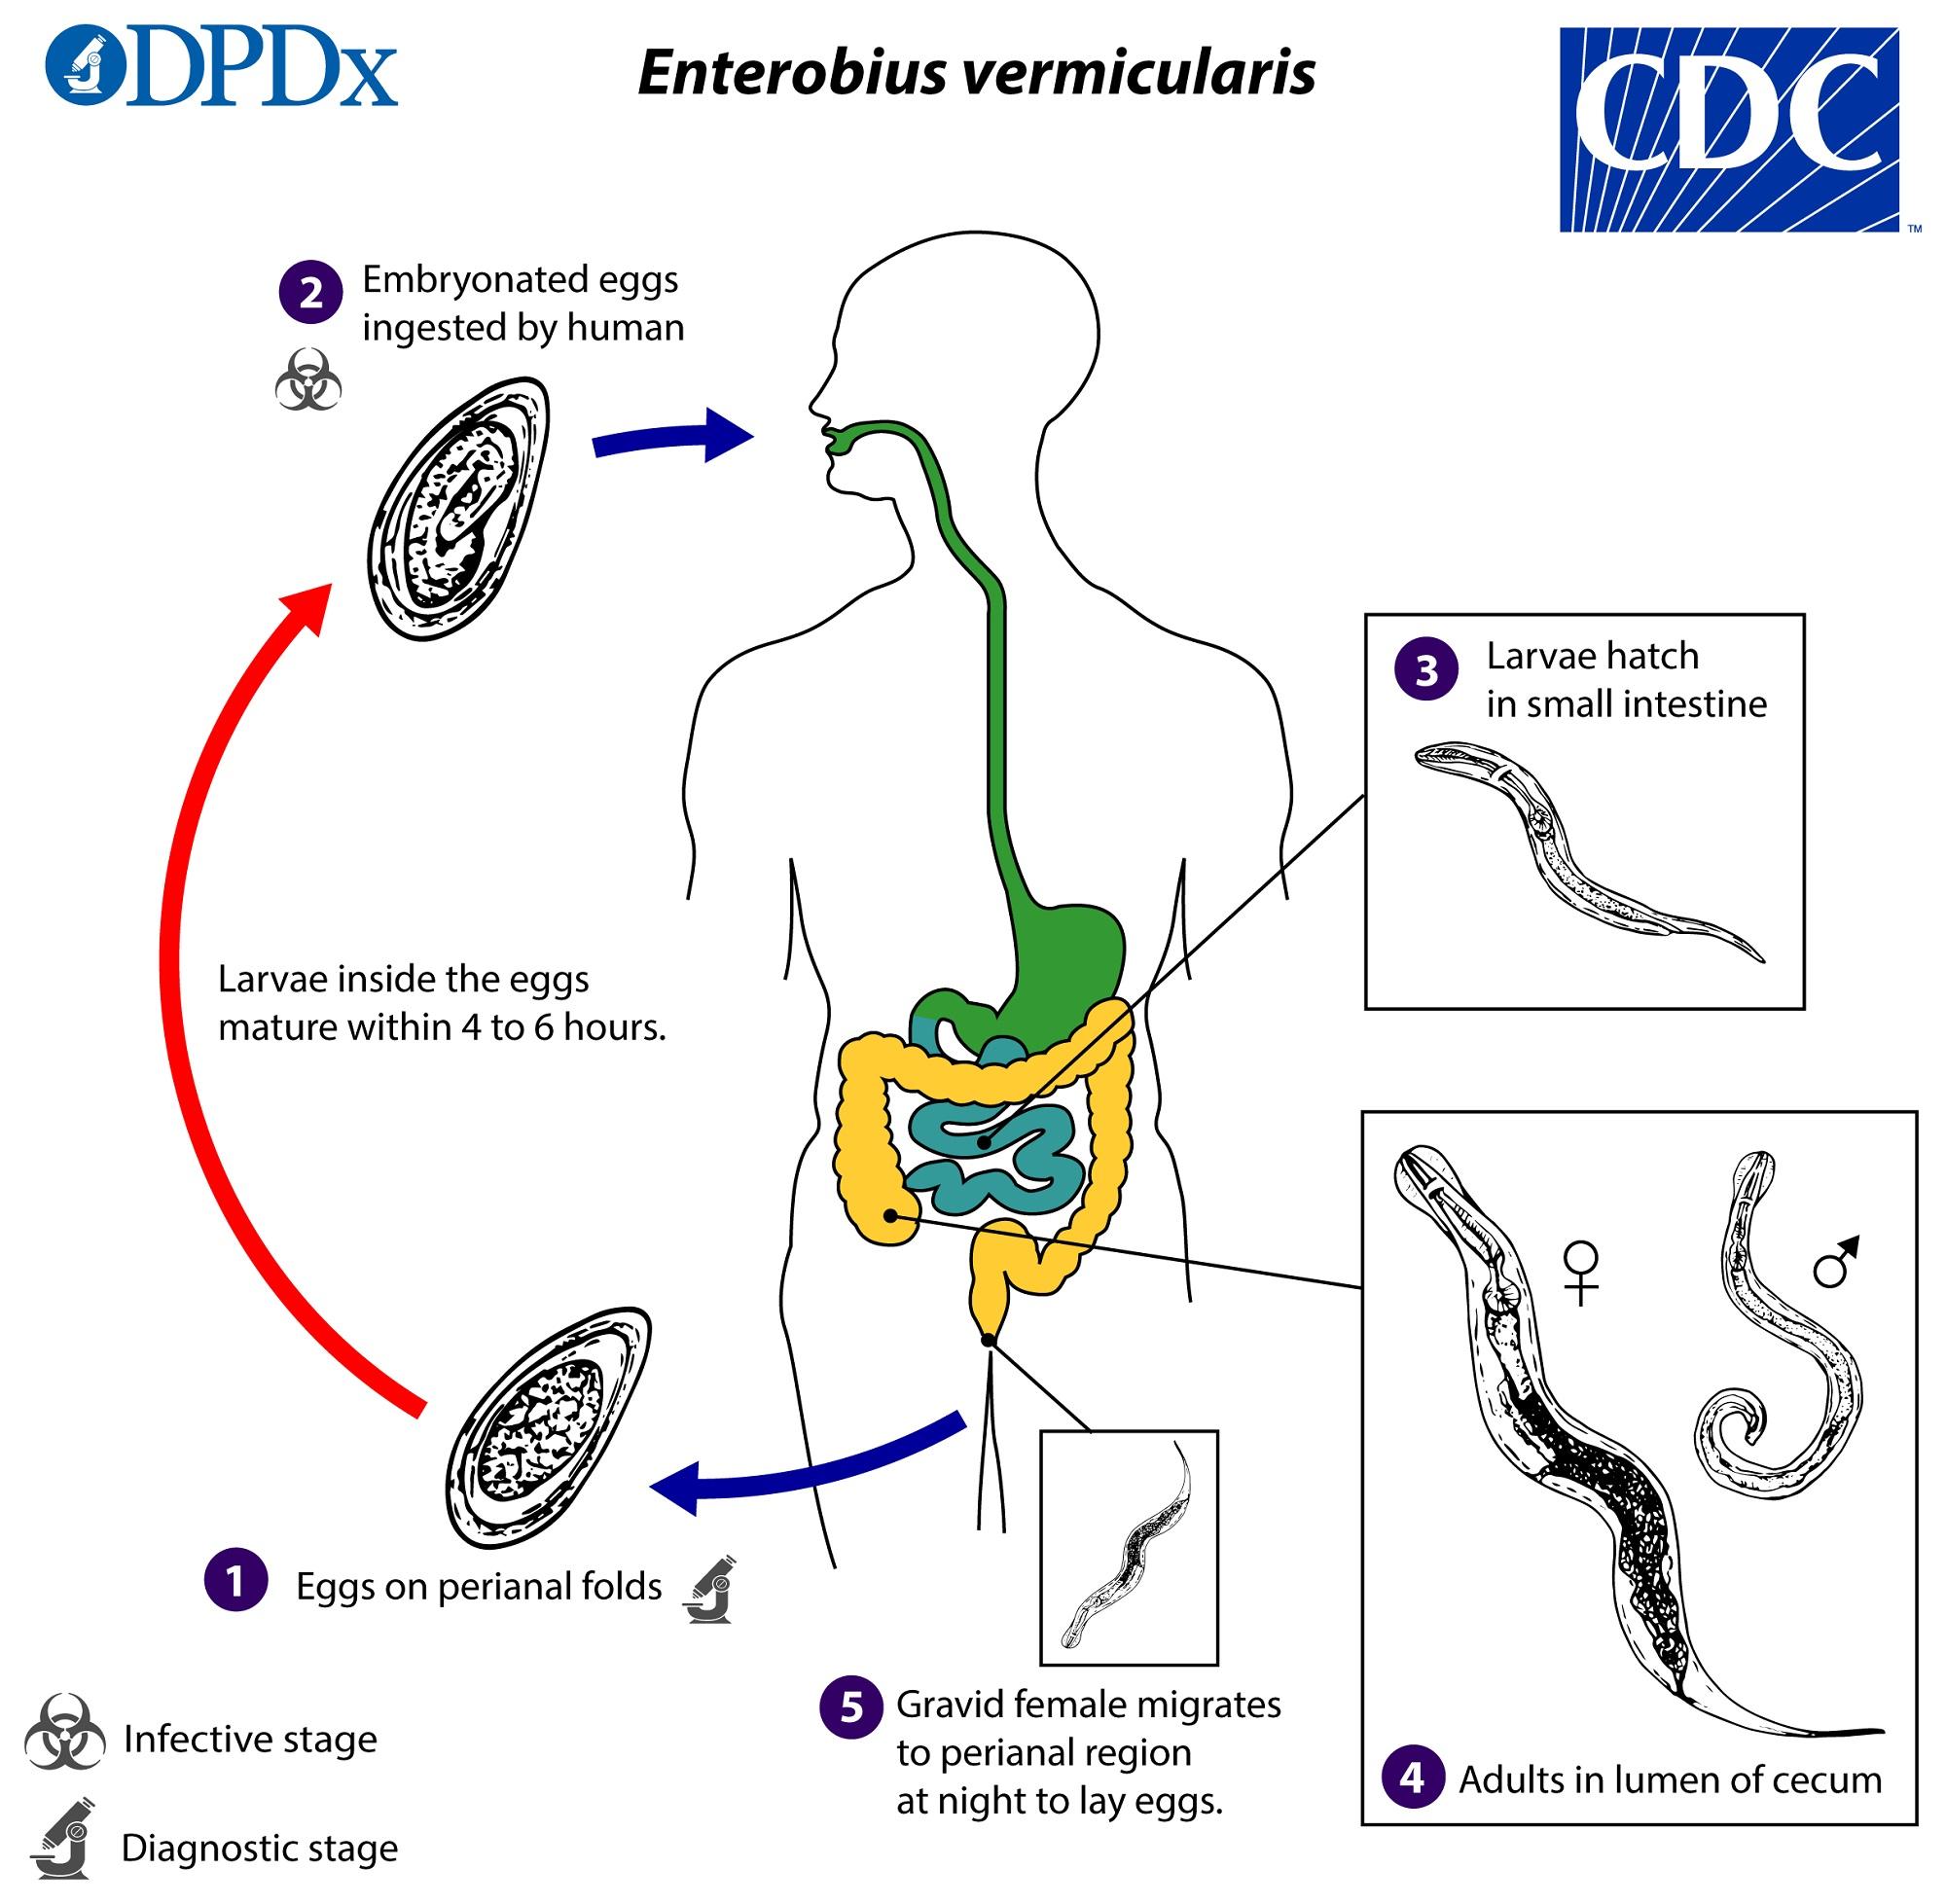 pinworm patogenezis a parazitaktol hogyan lehet felepulni